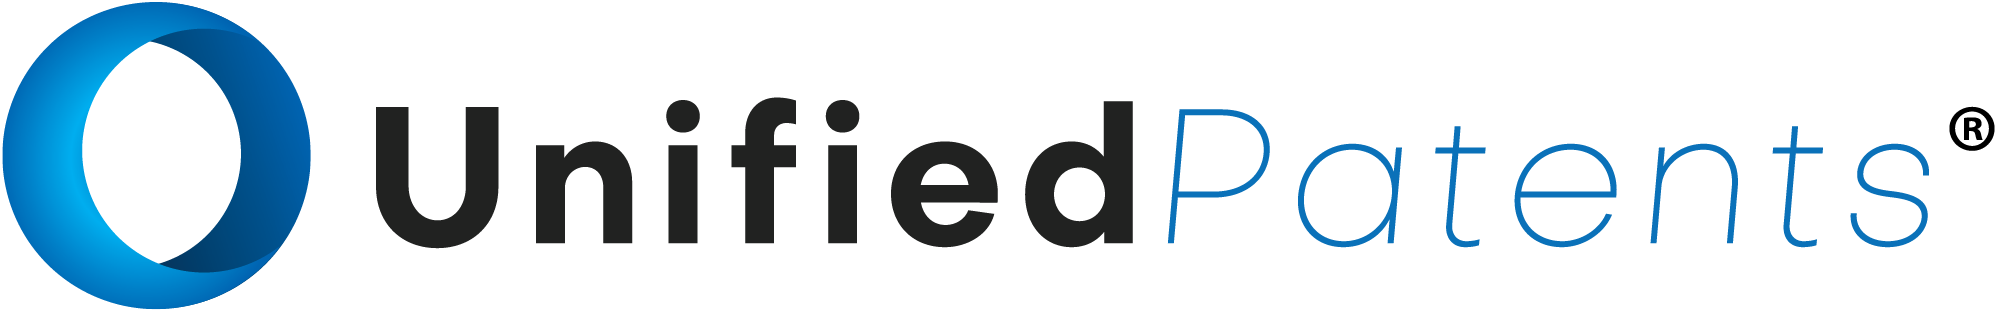 UnifiedPatents-Color-Logo-RTM-7080.png